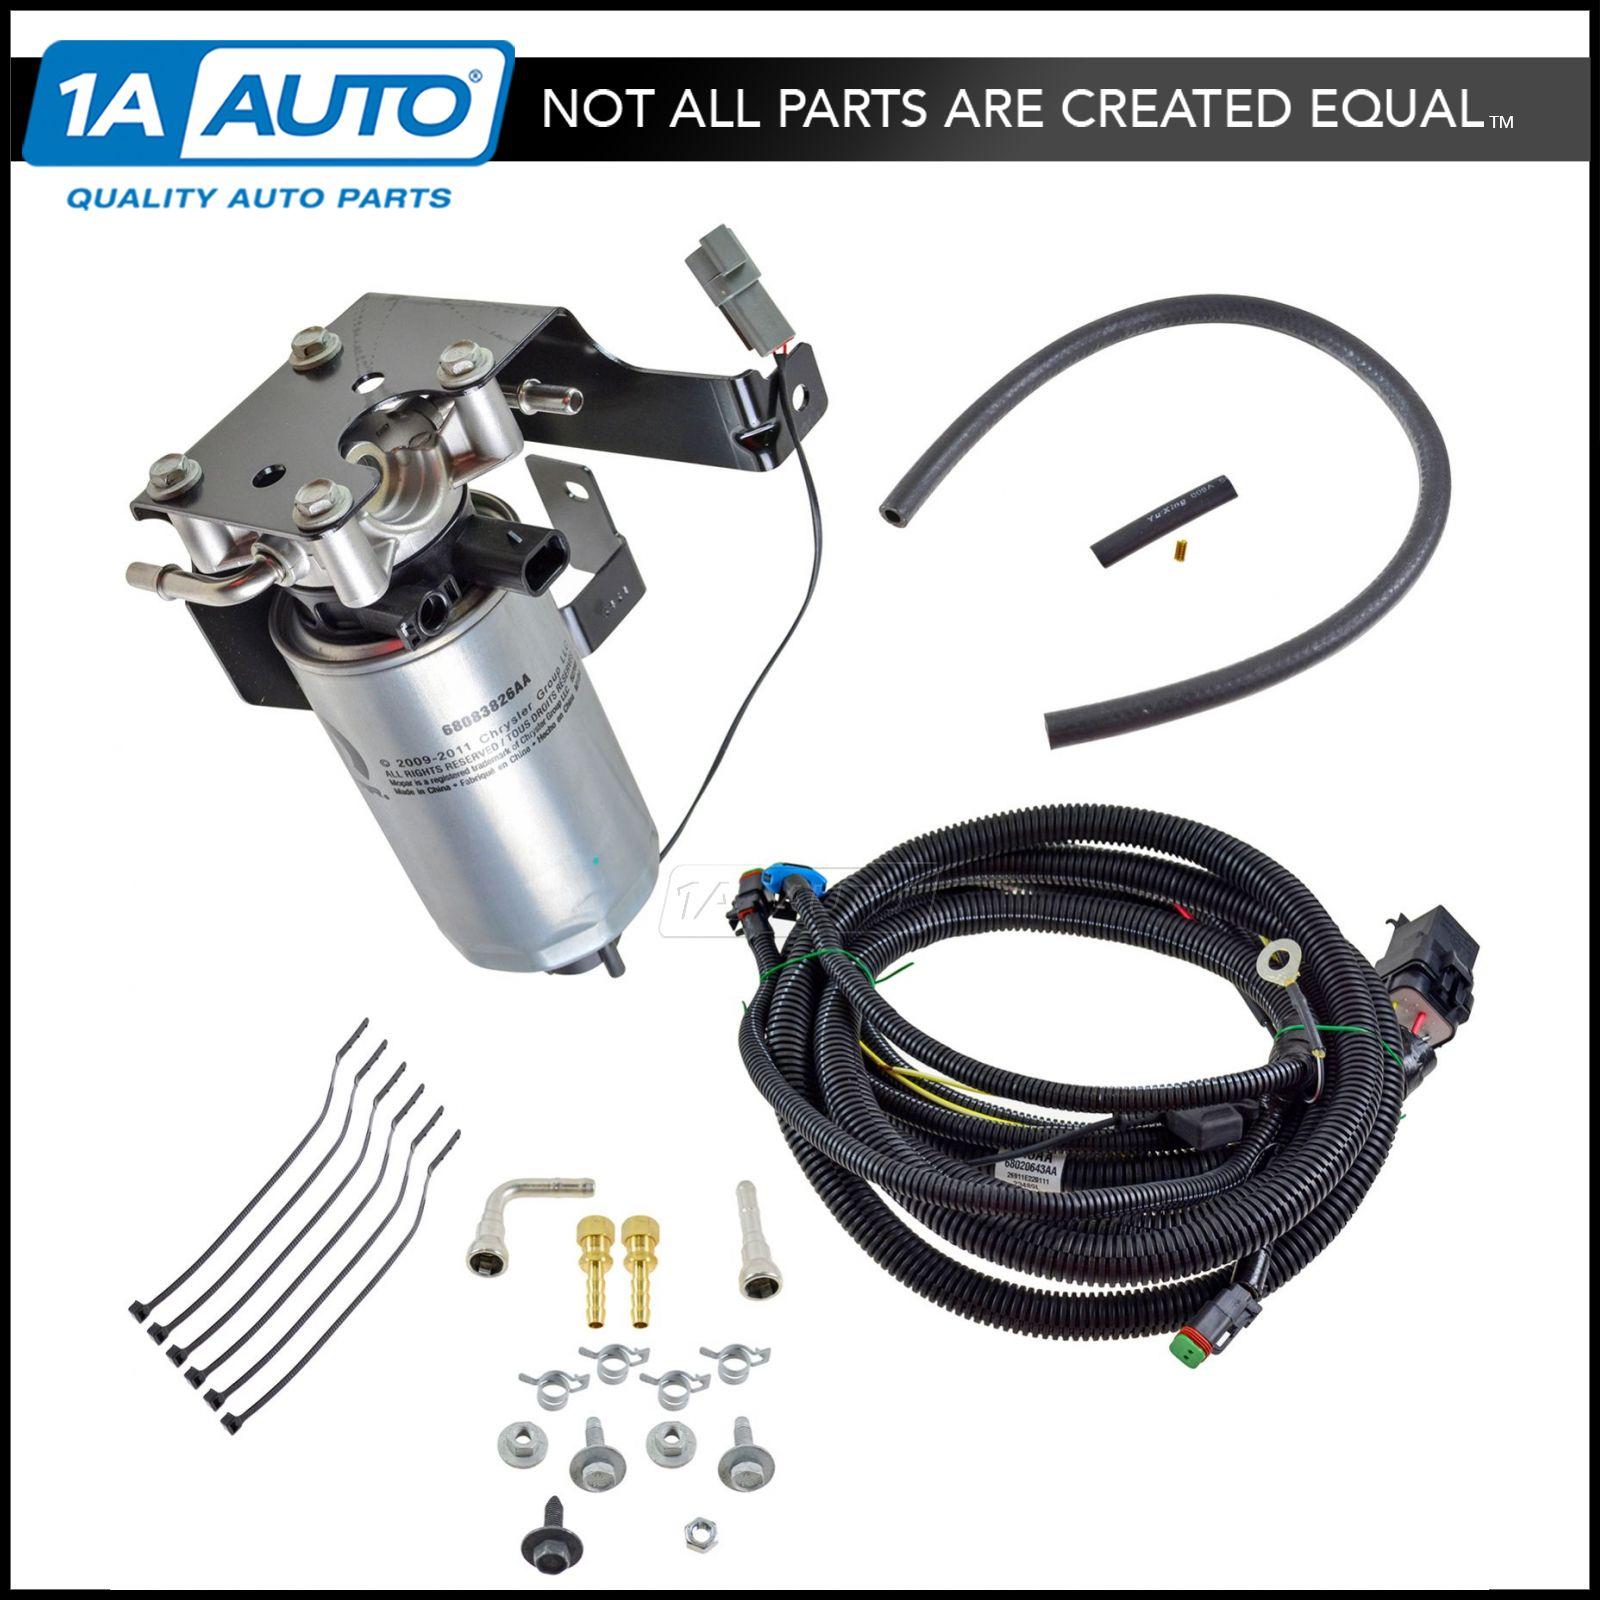 Oem Severe Duty Add On Fuel Filter System Kit For Dodge Ram 67l 2004 Diesel Location New